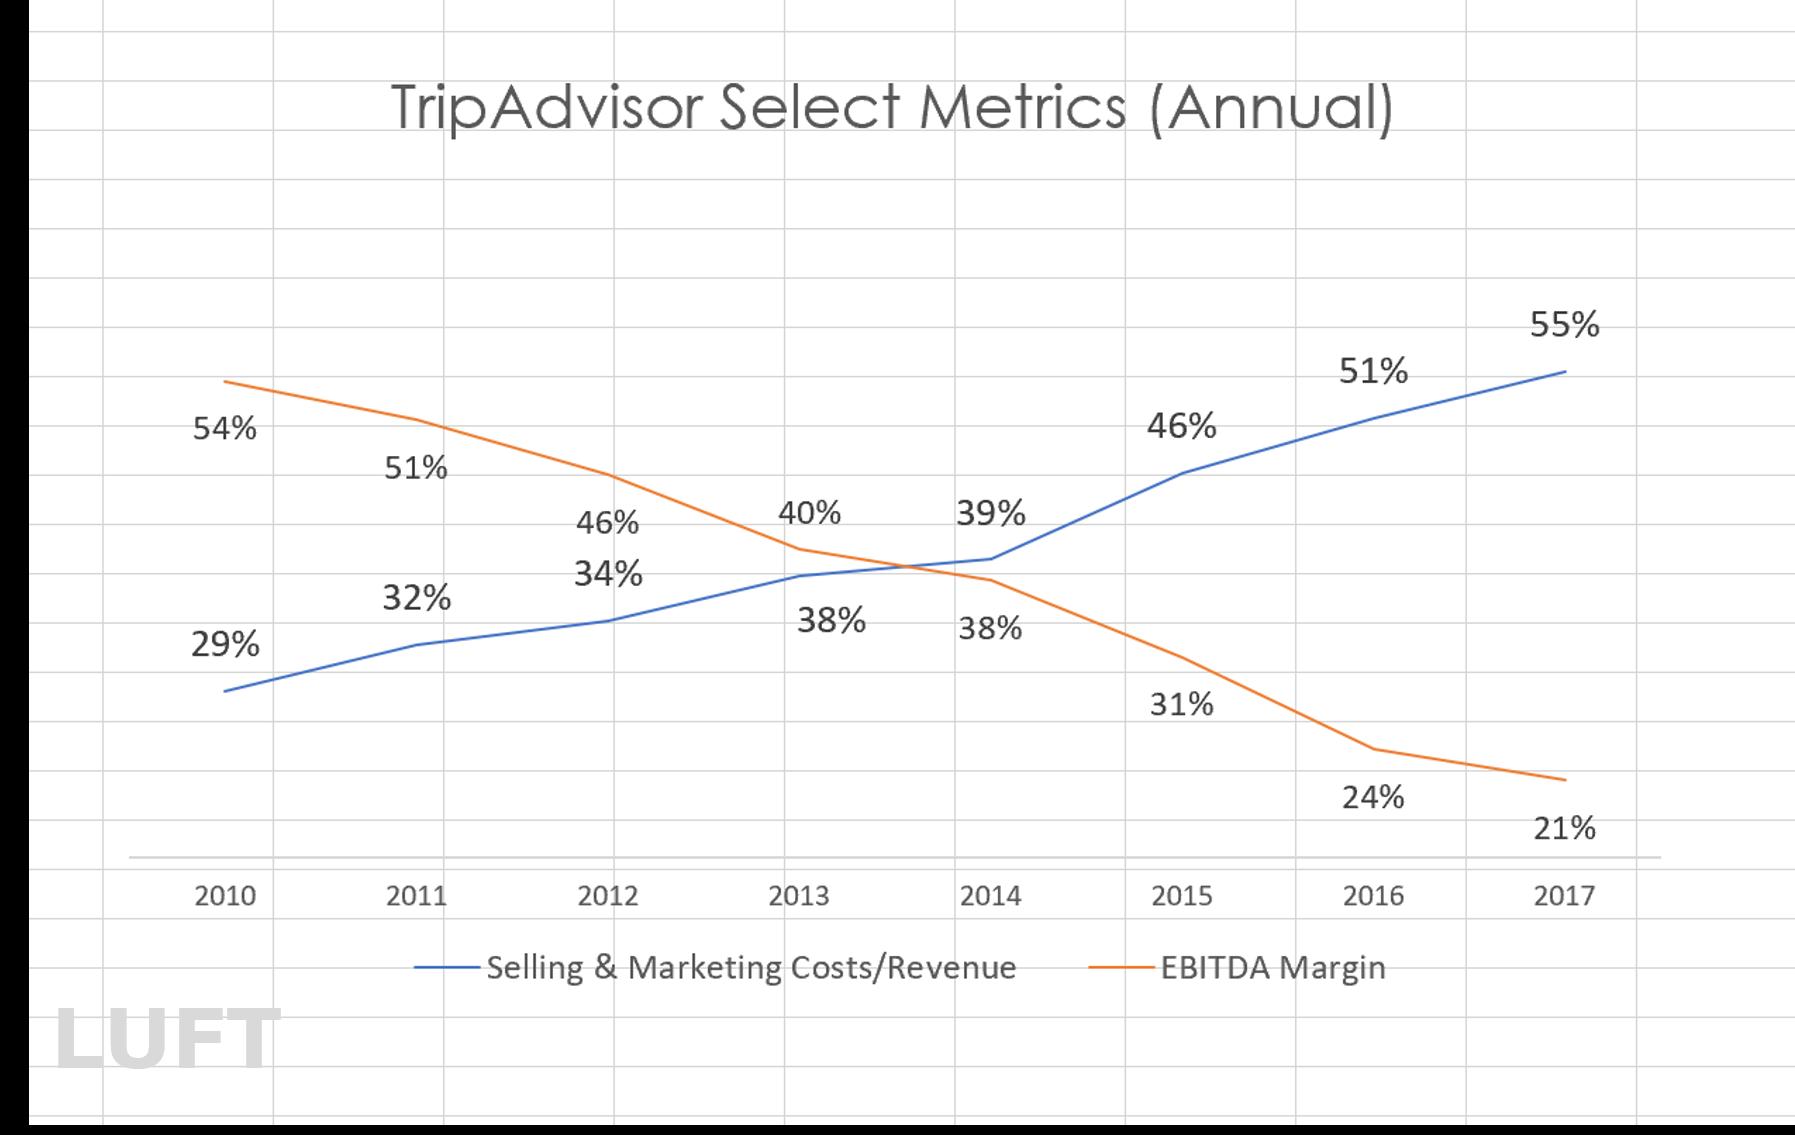 Source: LUFT, The 2020 Outlook On TripAdvisor